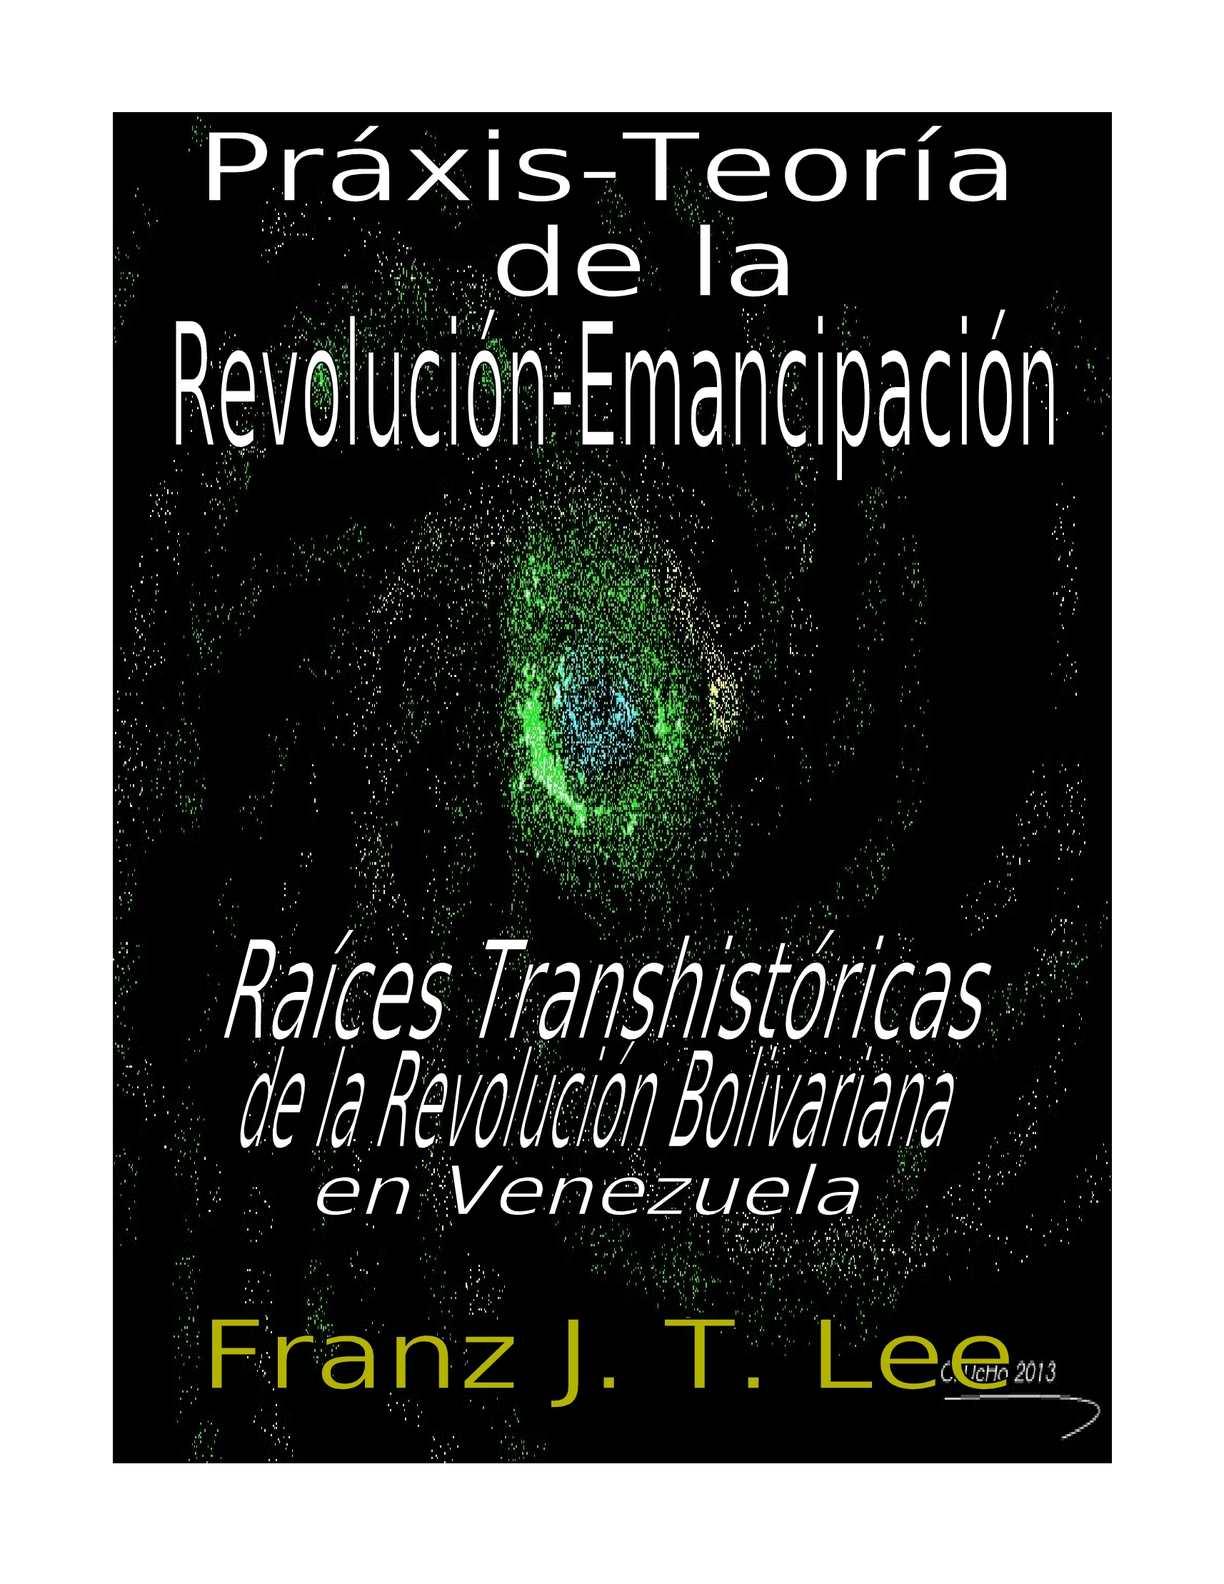 eace7c0f59c33 Calaméo - PRAXIS-TEORIA DE LA REVOLUCION-EMANCIPACION